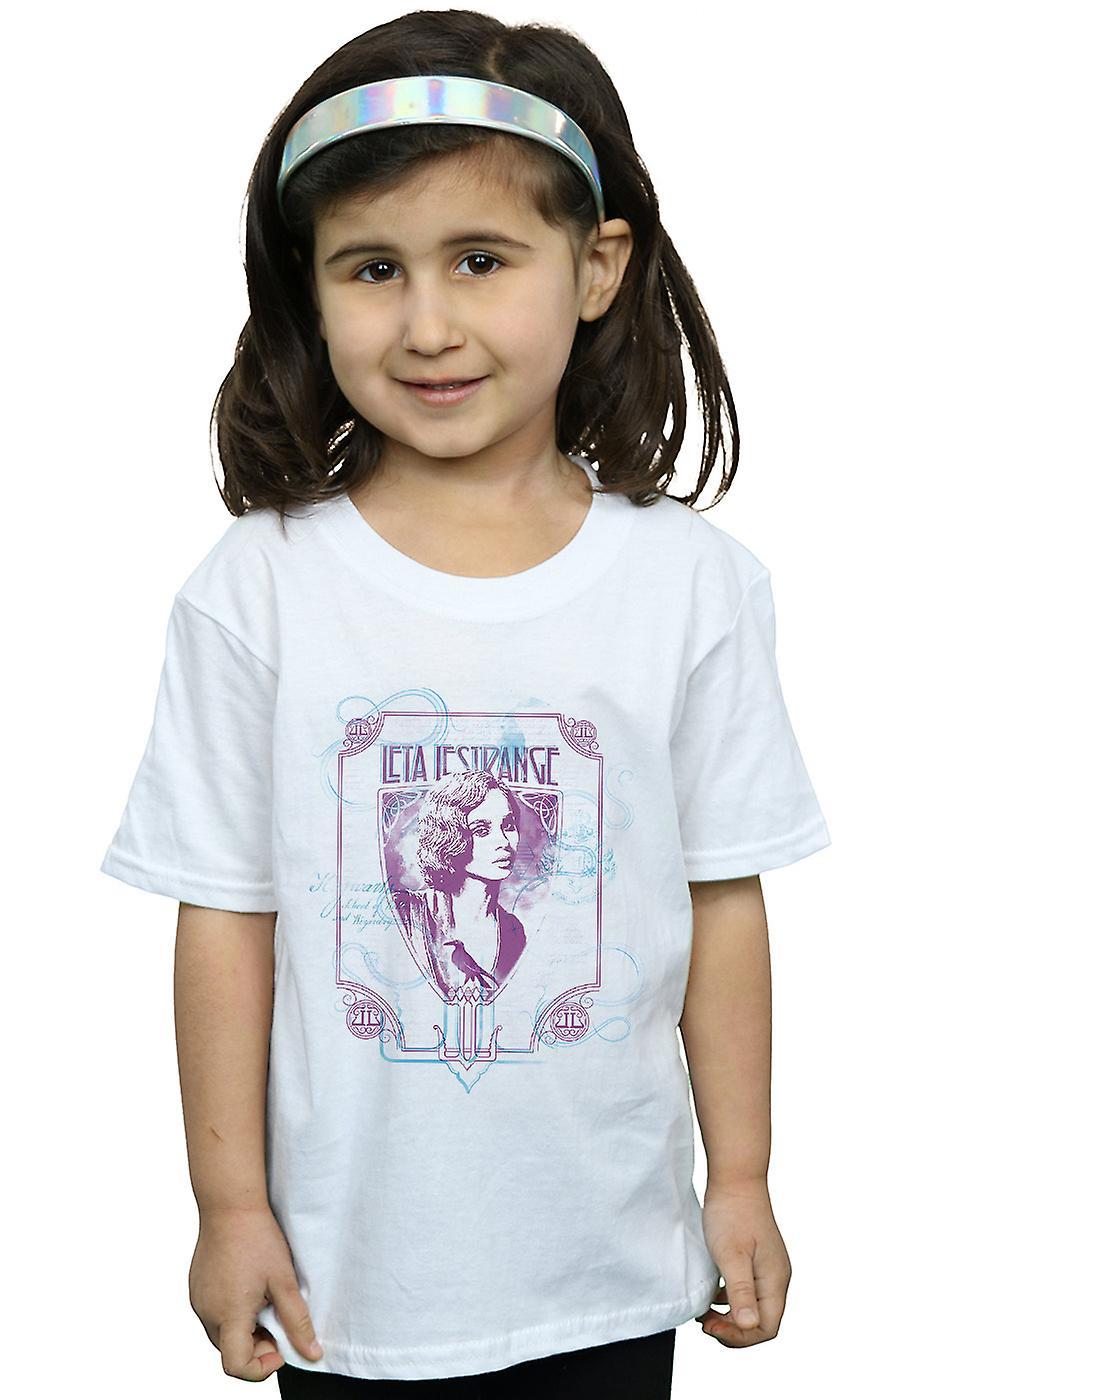 Fantastic Beasts 2 Girls Leta Lestrange T Shirt